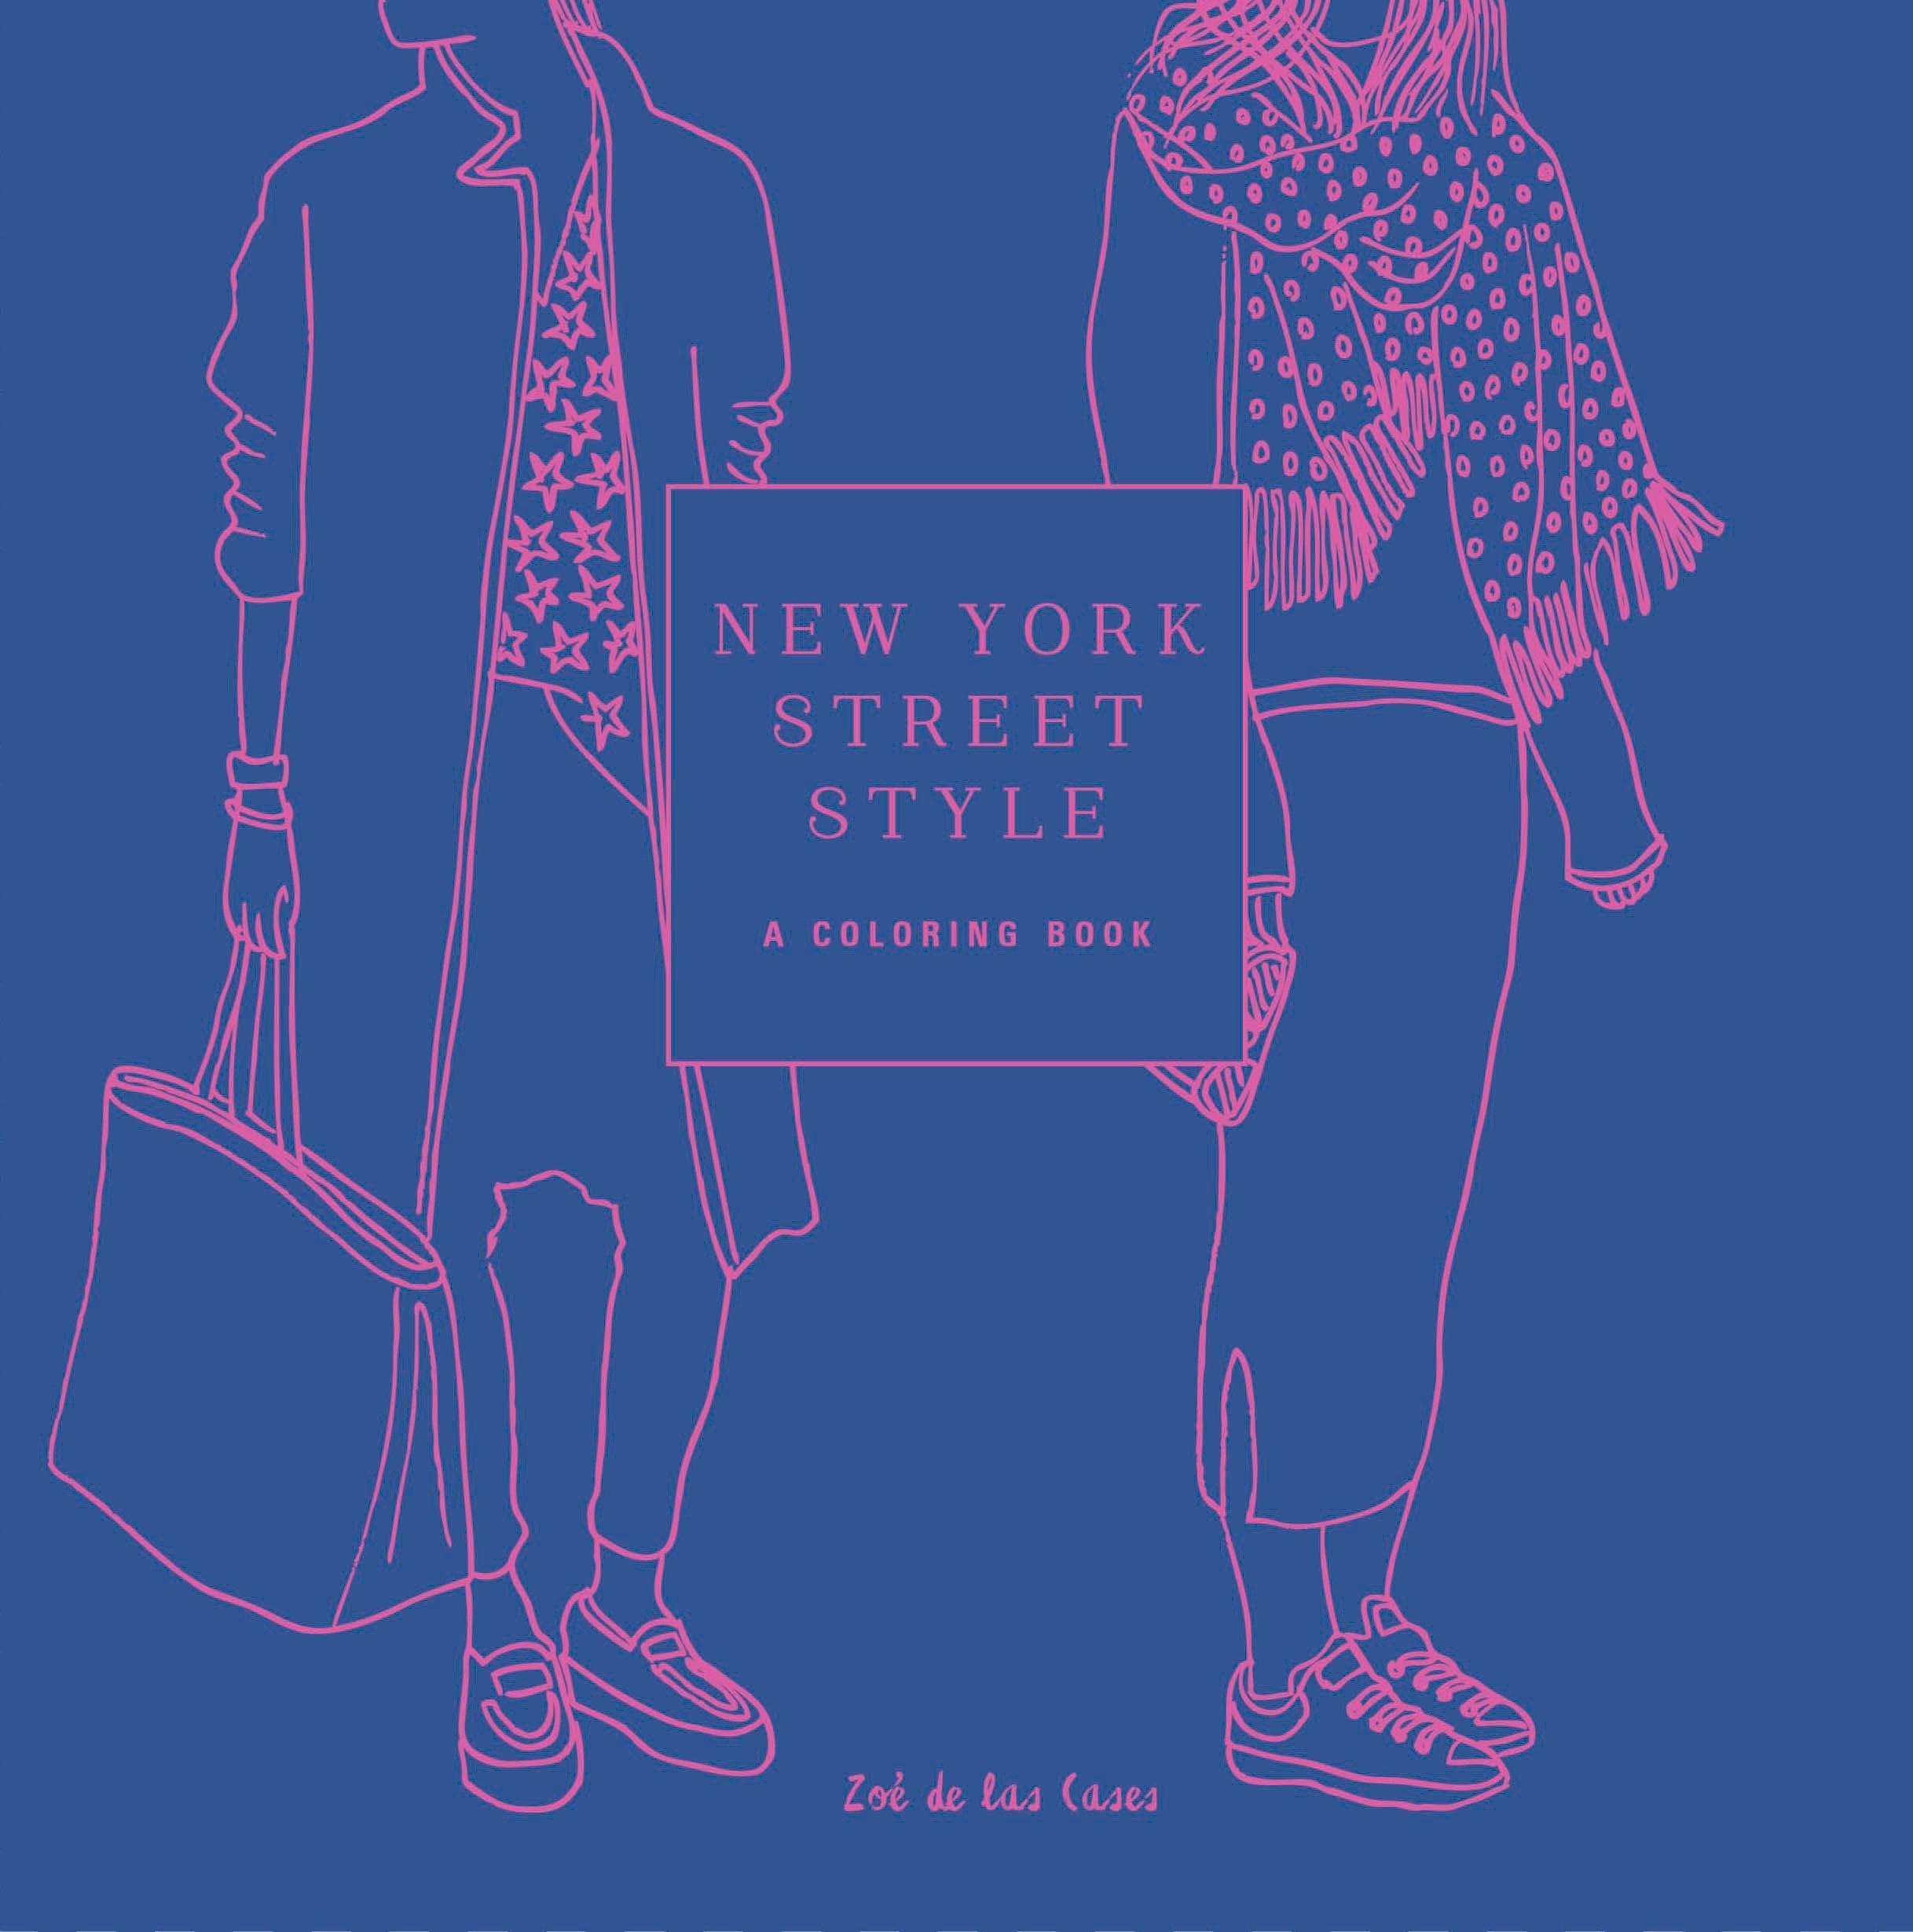 New York Street Style A Coloring Book Books Zoe De Las Cases 9781524760229 Amazon